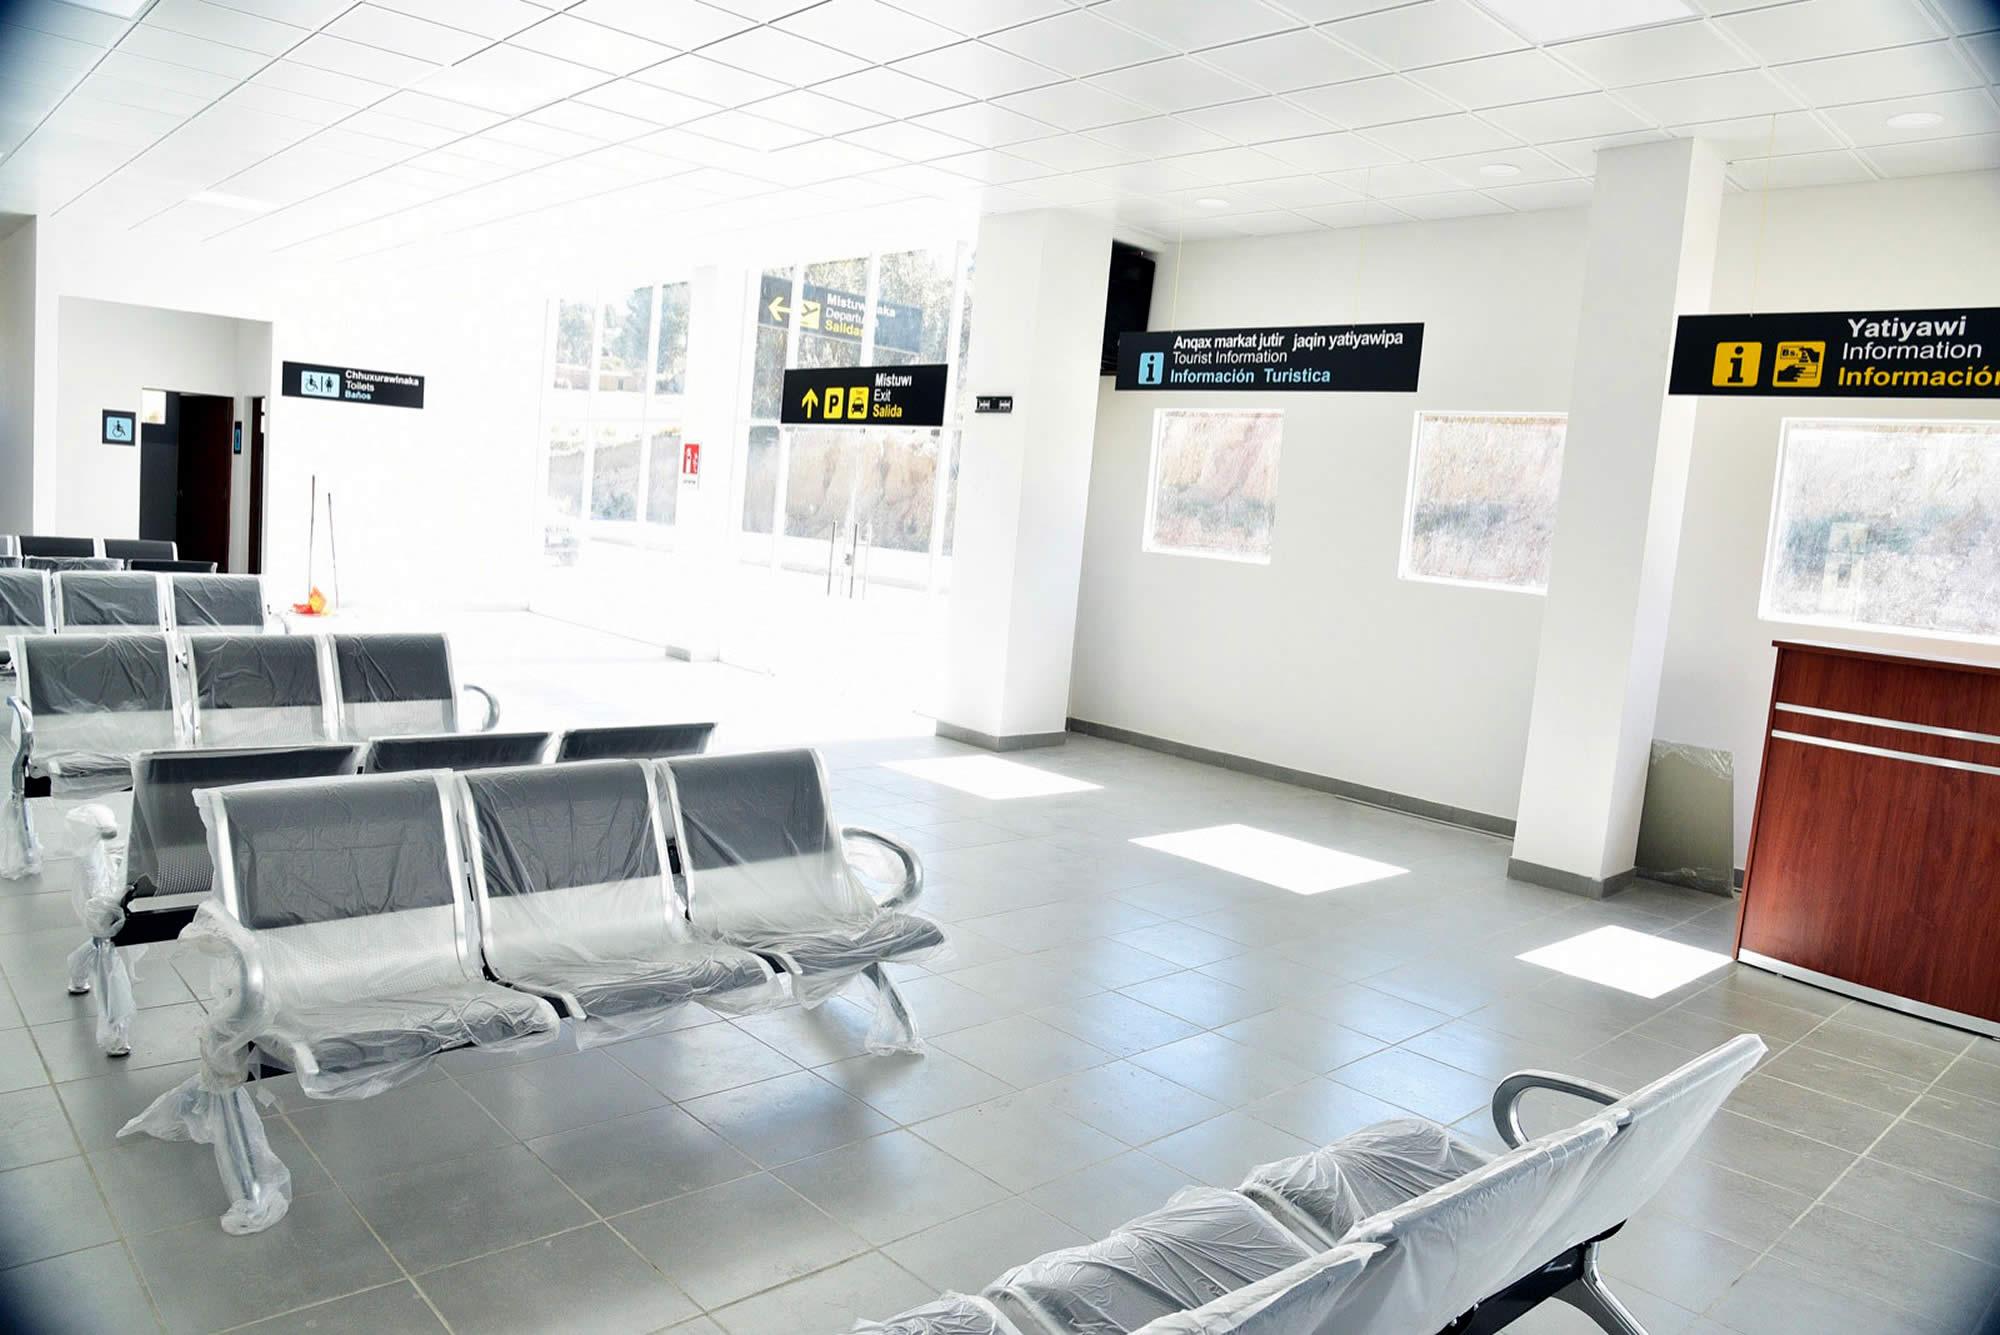 Copacabana Airport, Bolivia